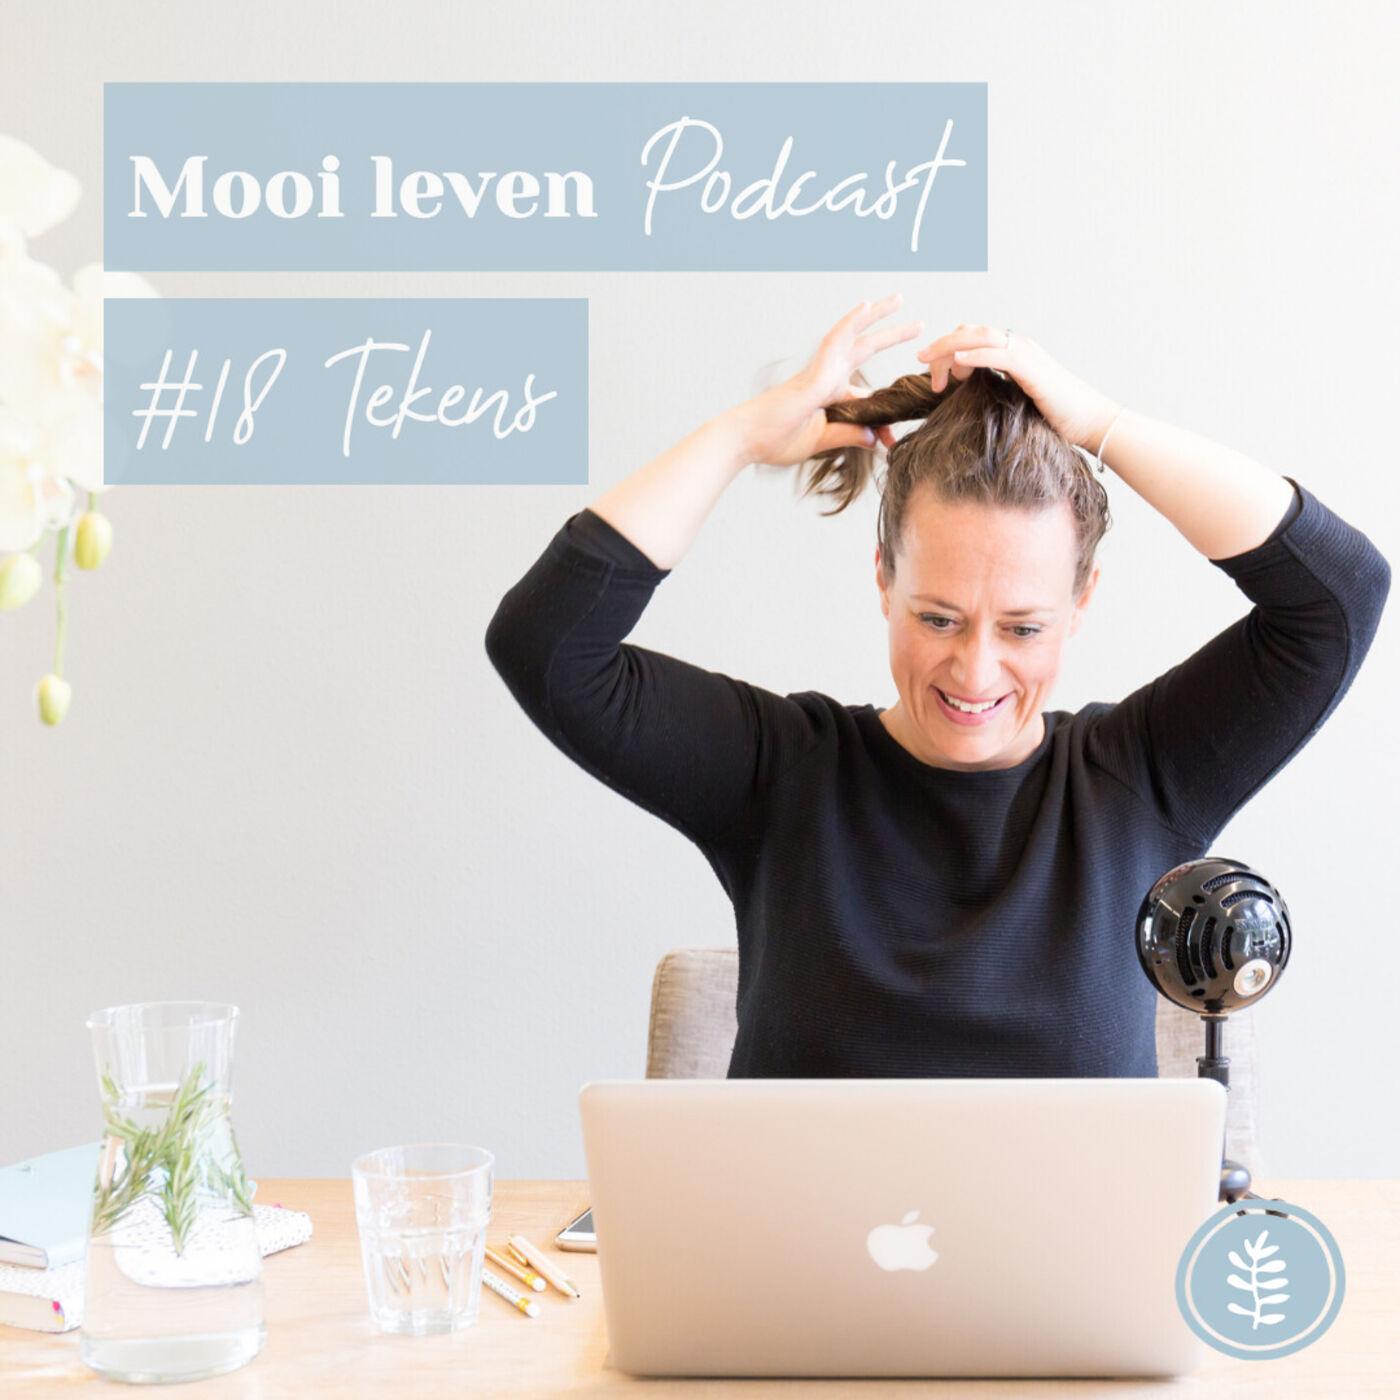 Mooi Leven Podcast #18 | Waarom ik in tekens geloof